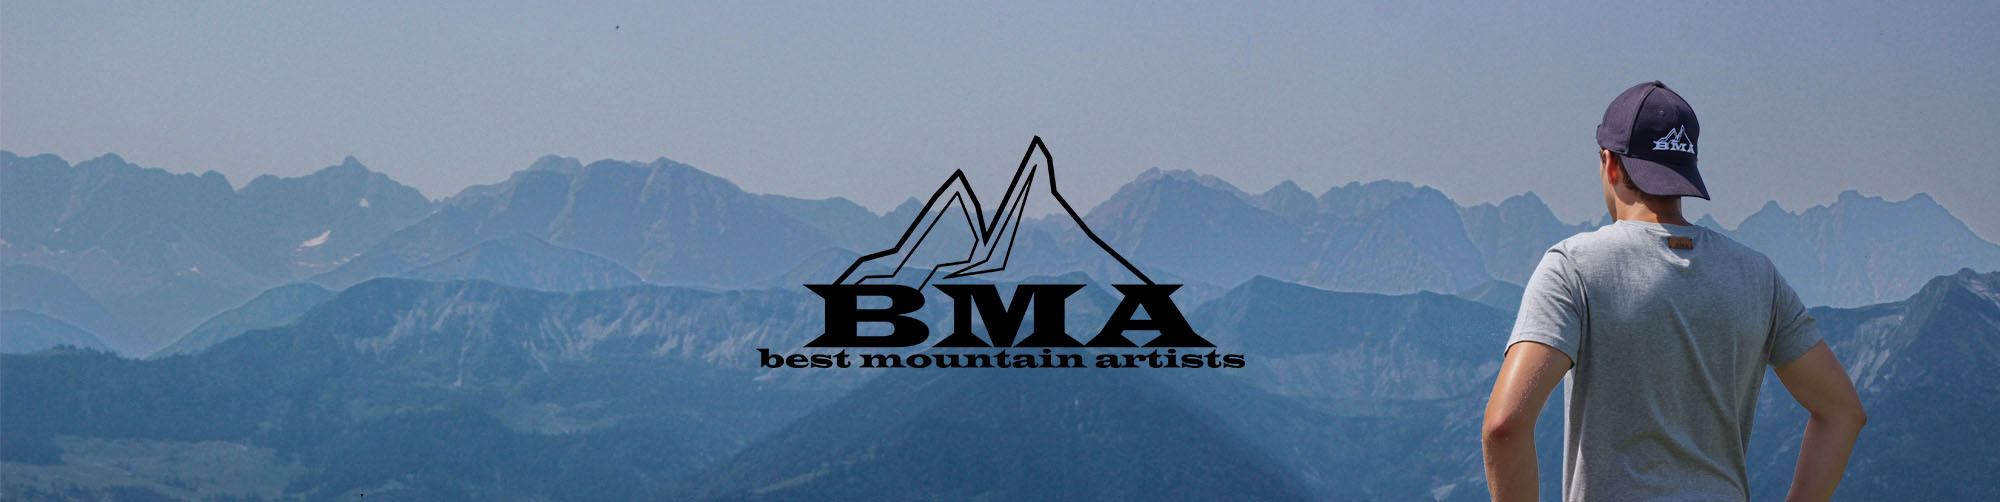 Best Mountain Artists